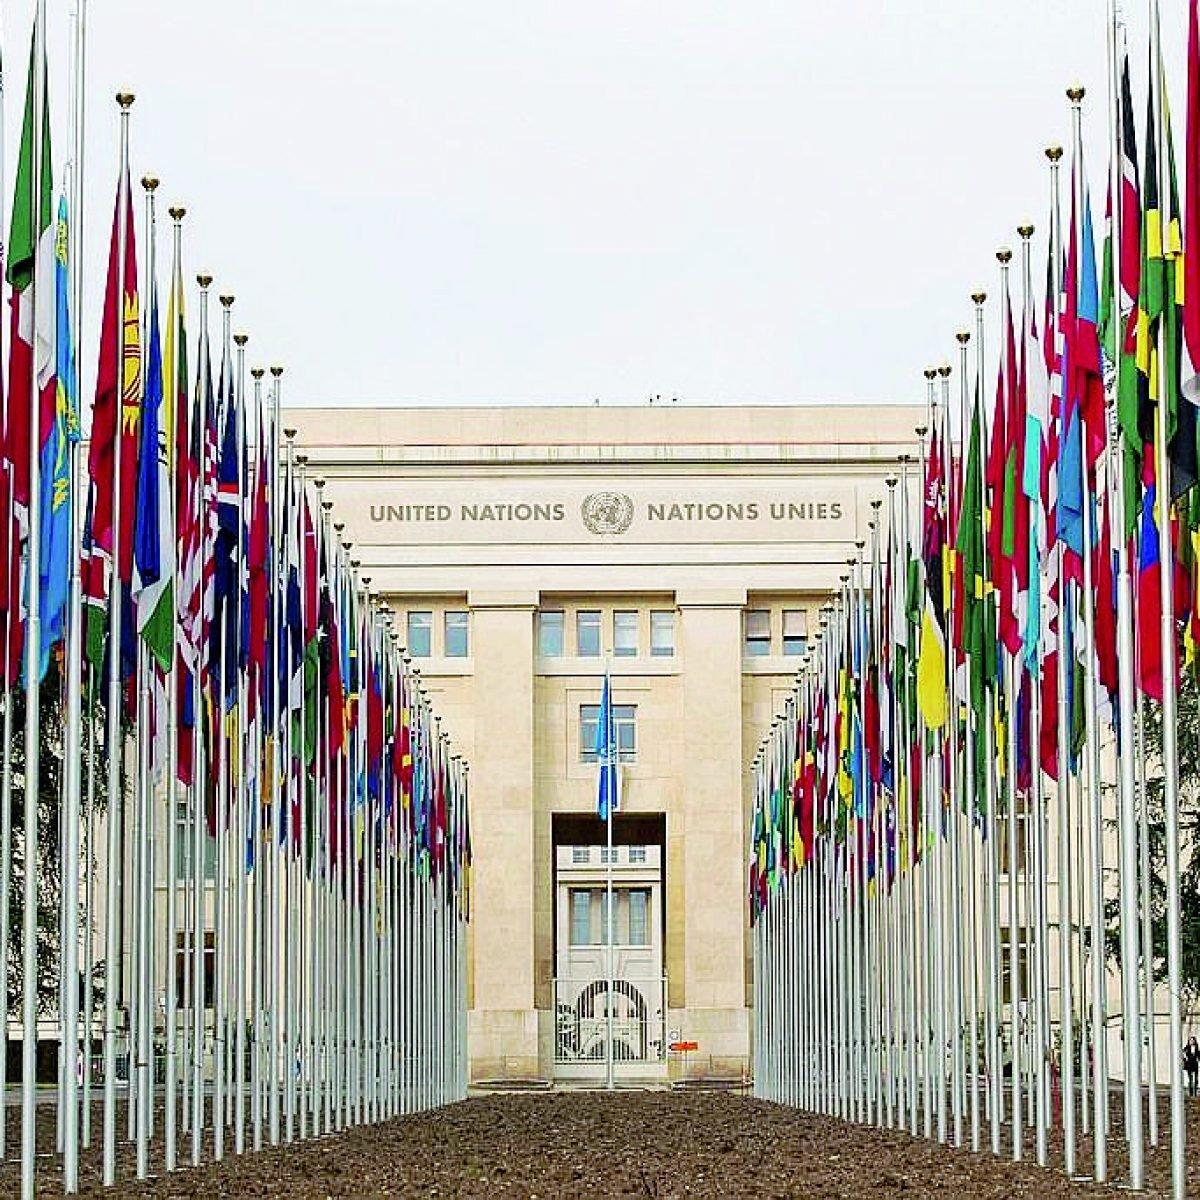 Diritti umani, dall'Onu i complimenti a San Marino